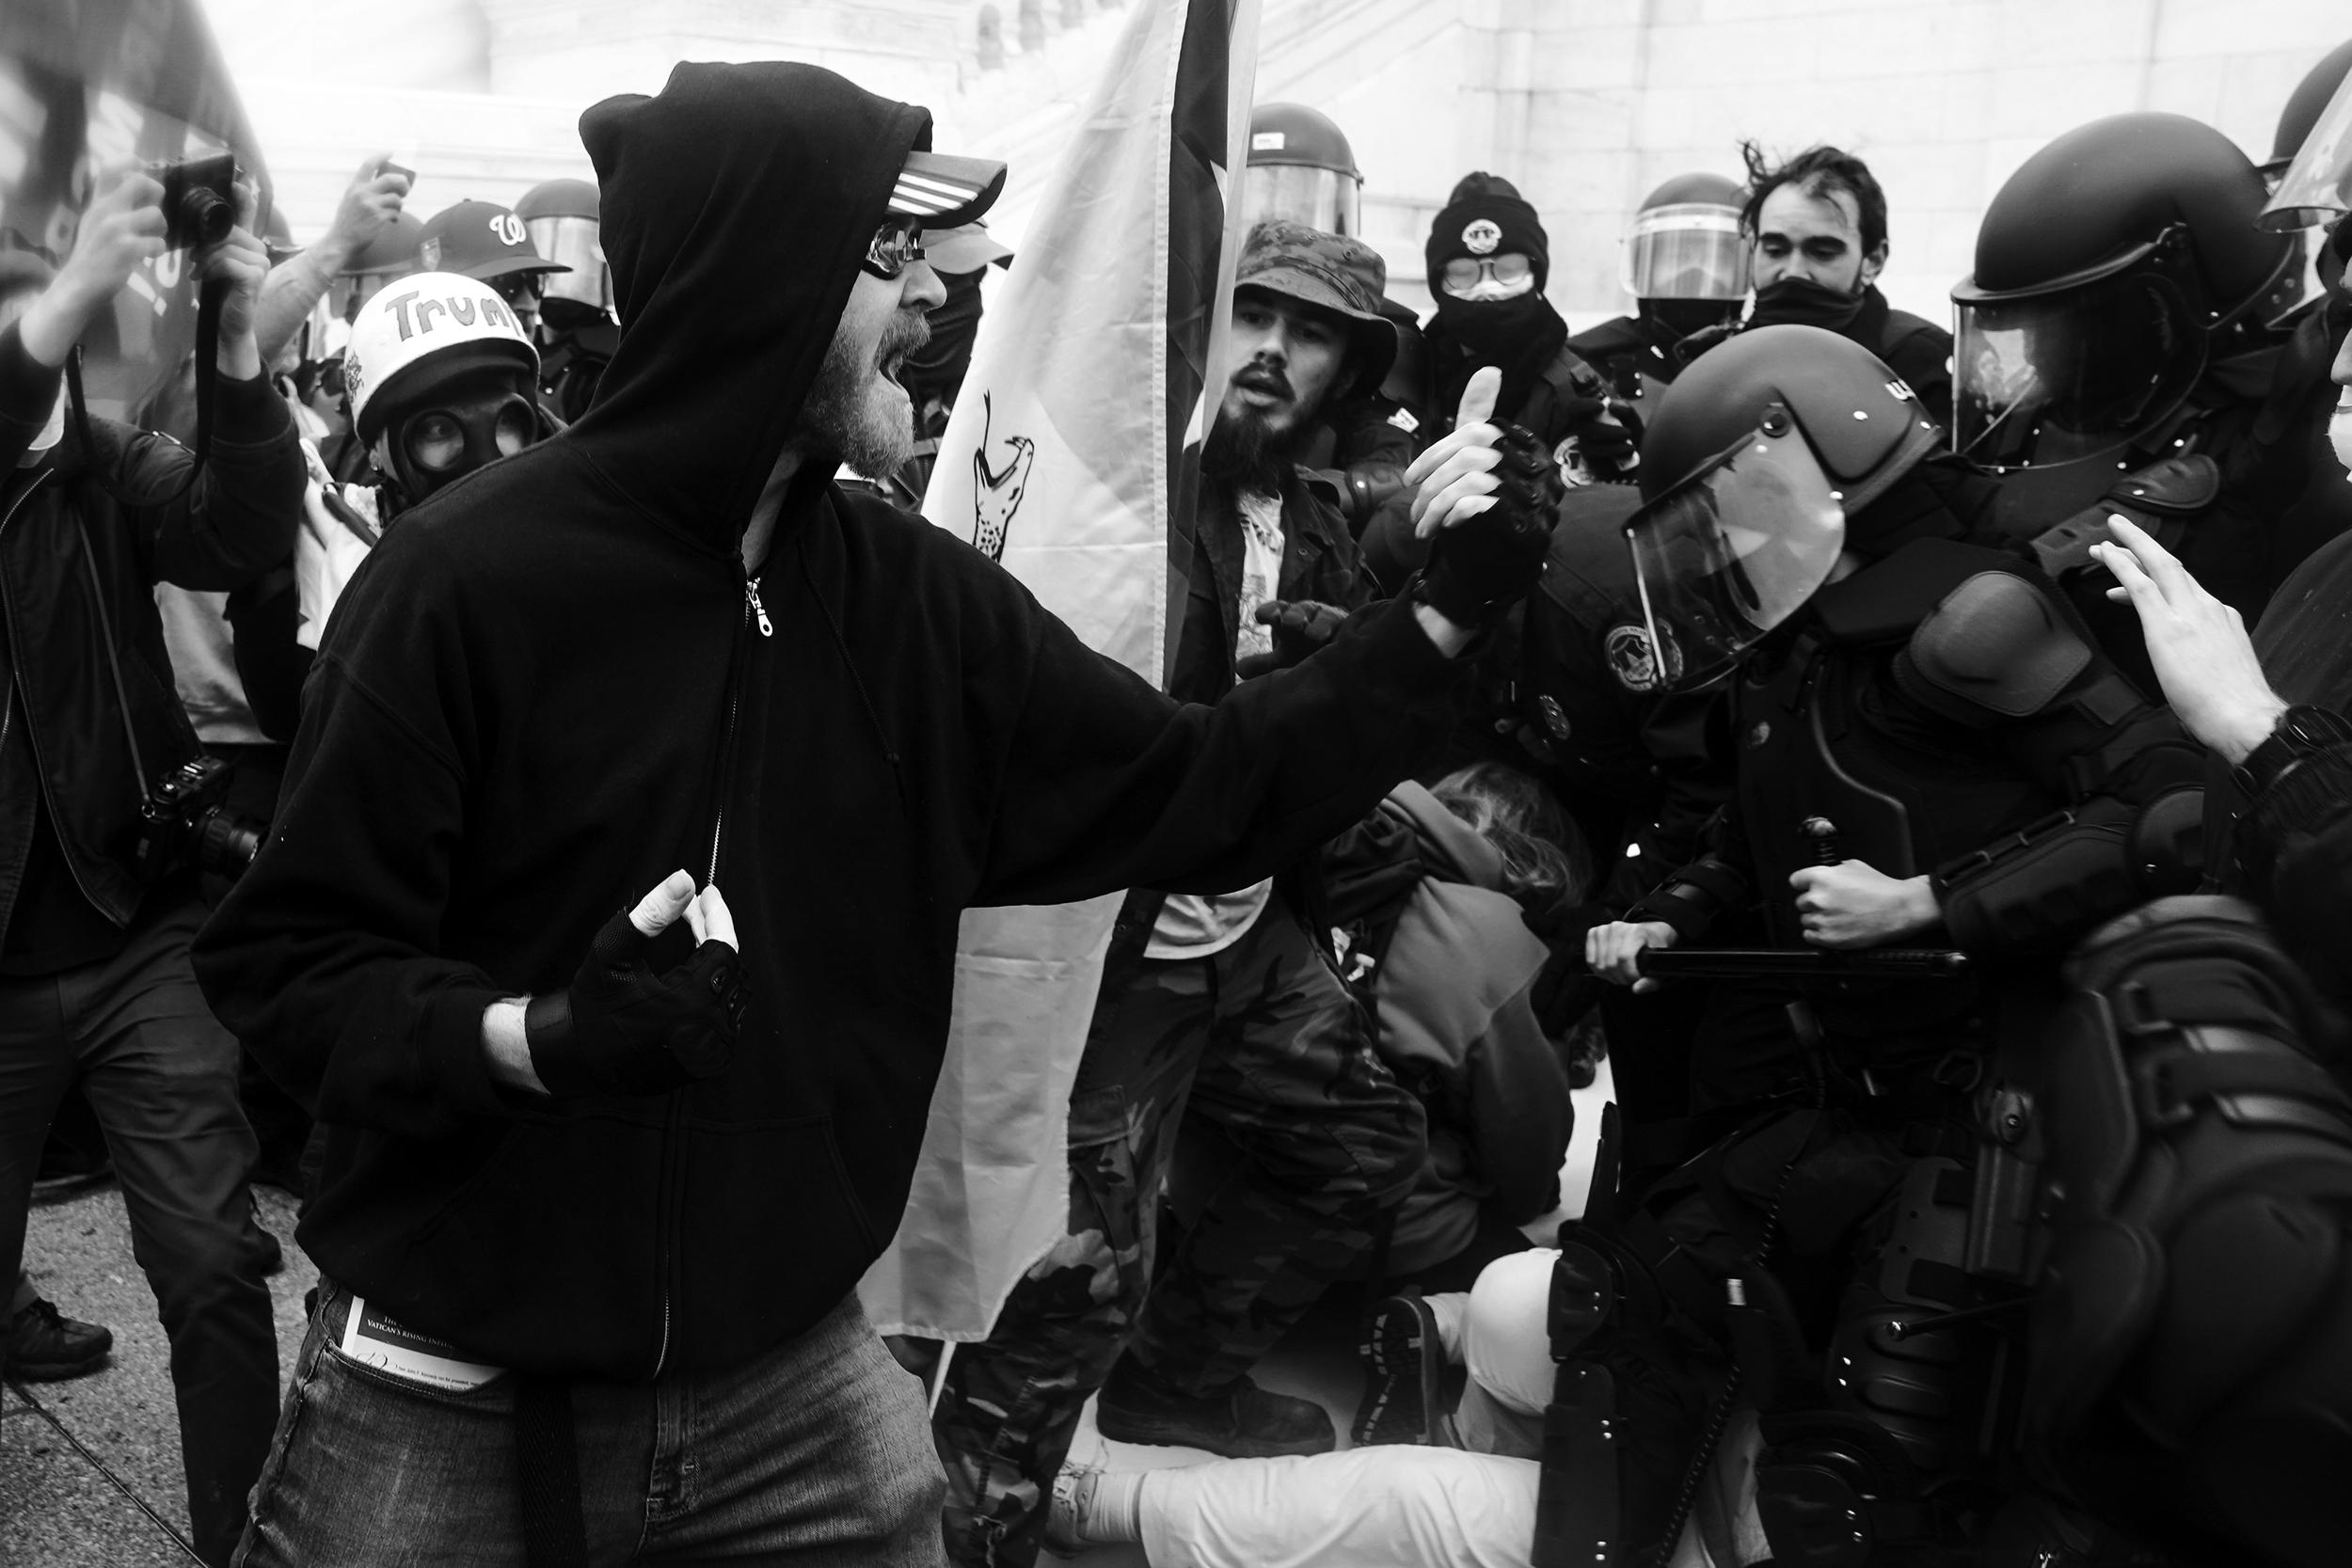 Black citizenship is still a myth. The Capitol riot response proves it.